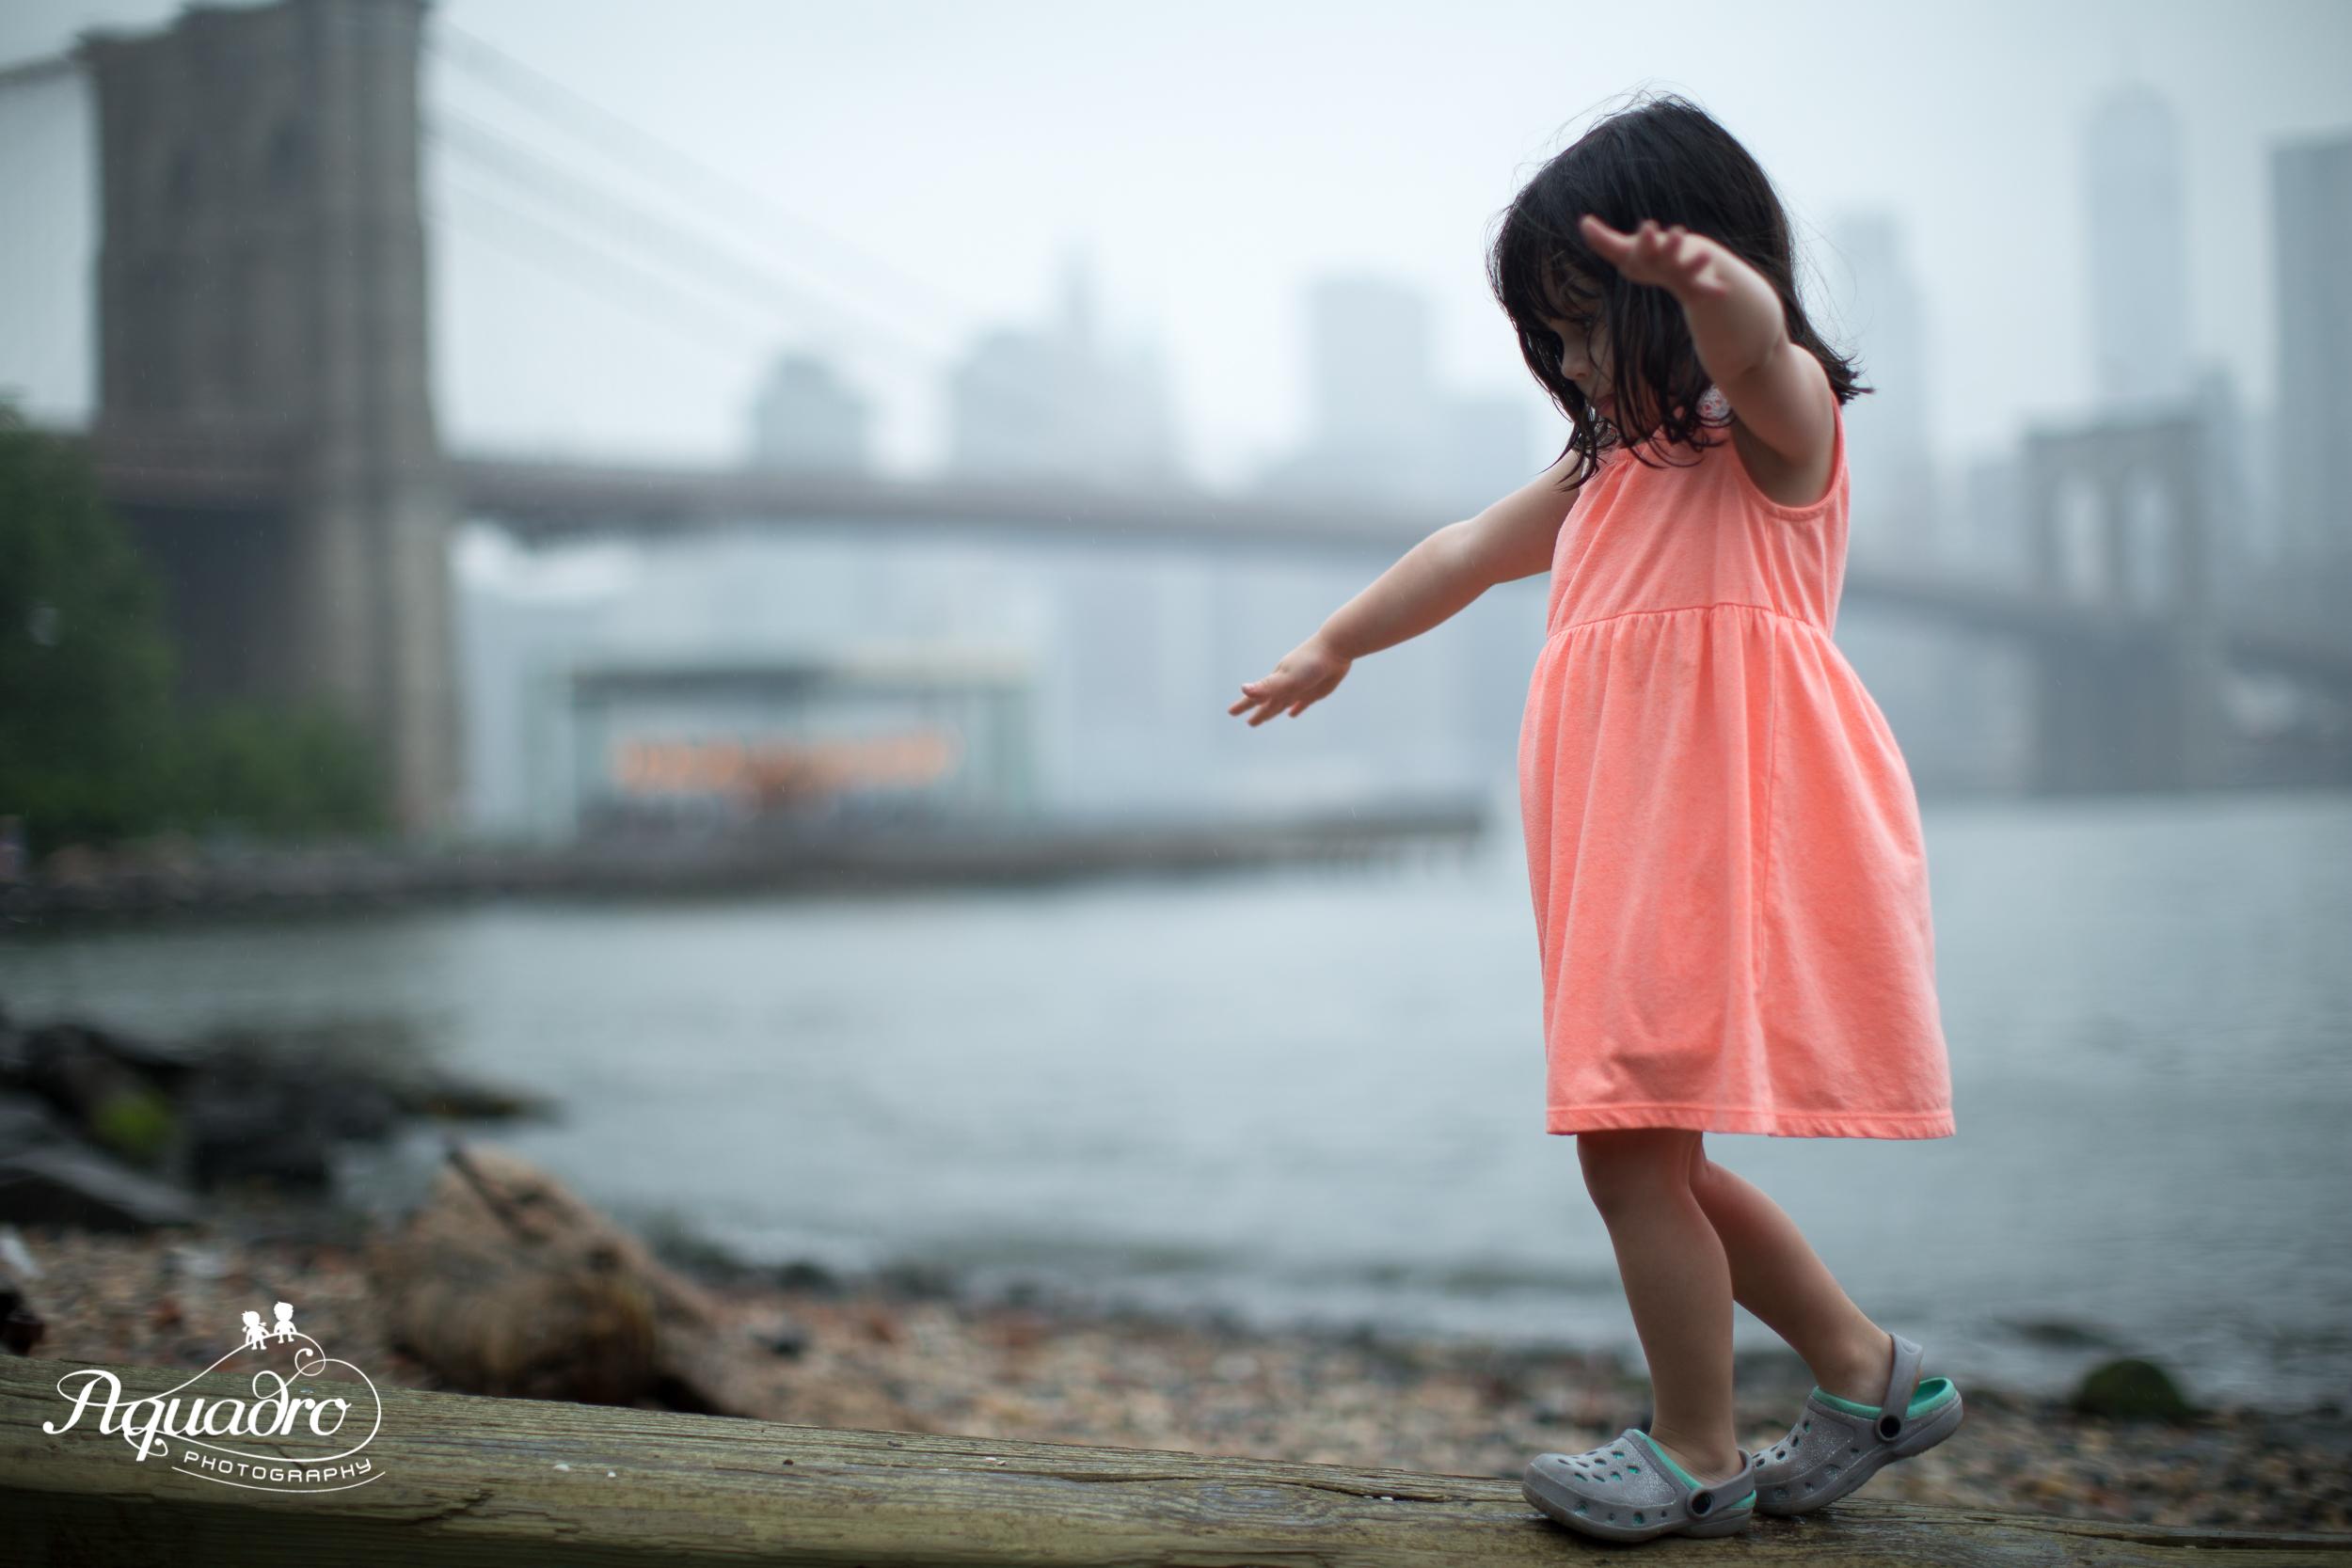 Balance Beam by the Brooklyn Bridge